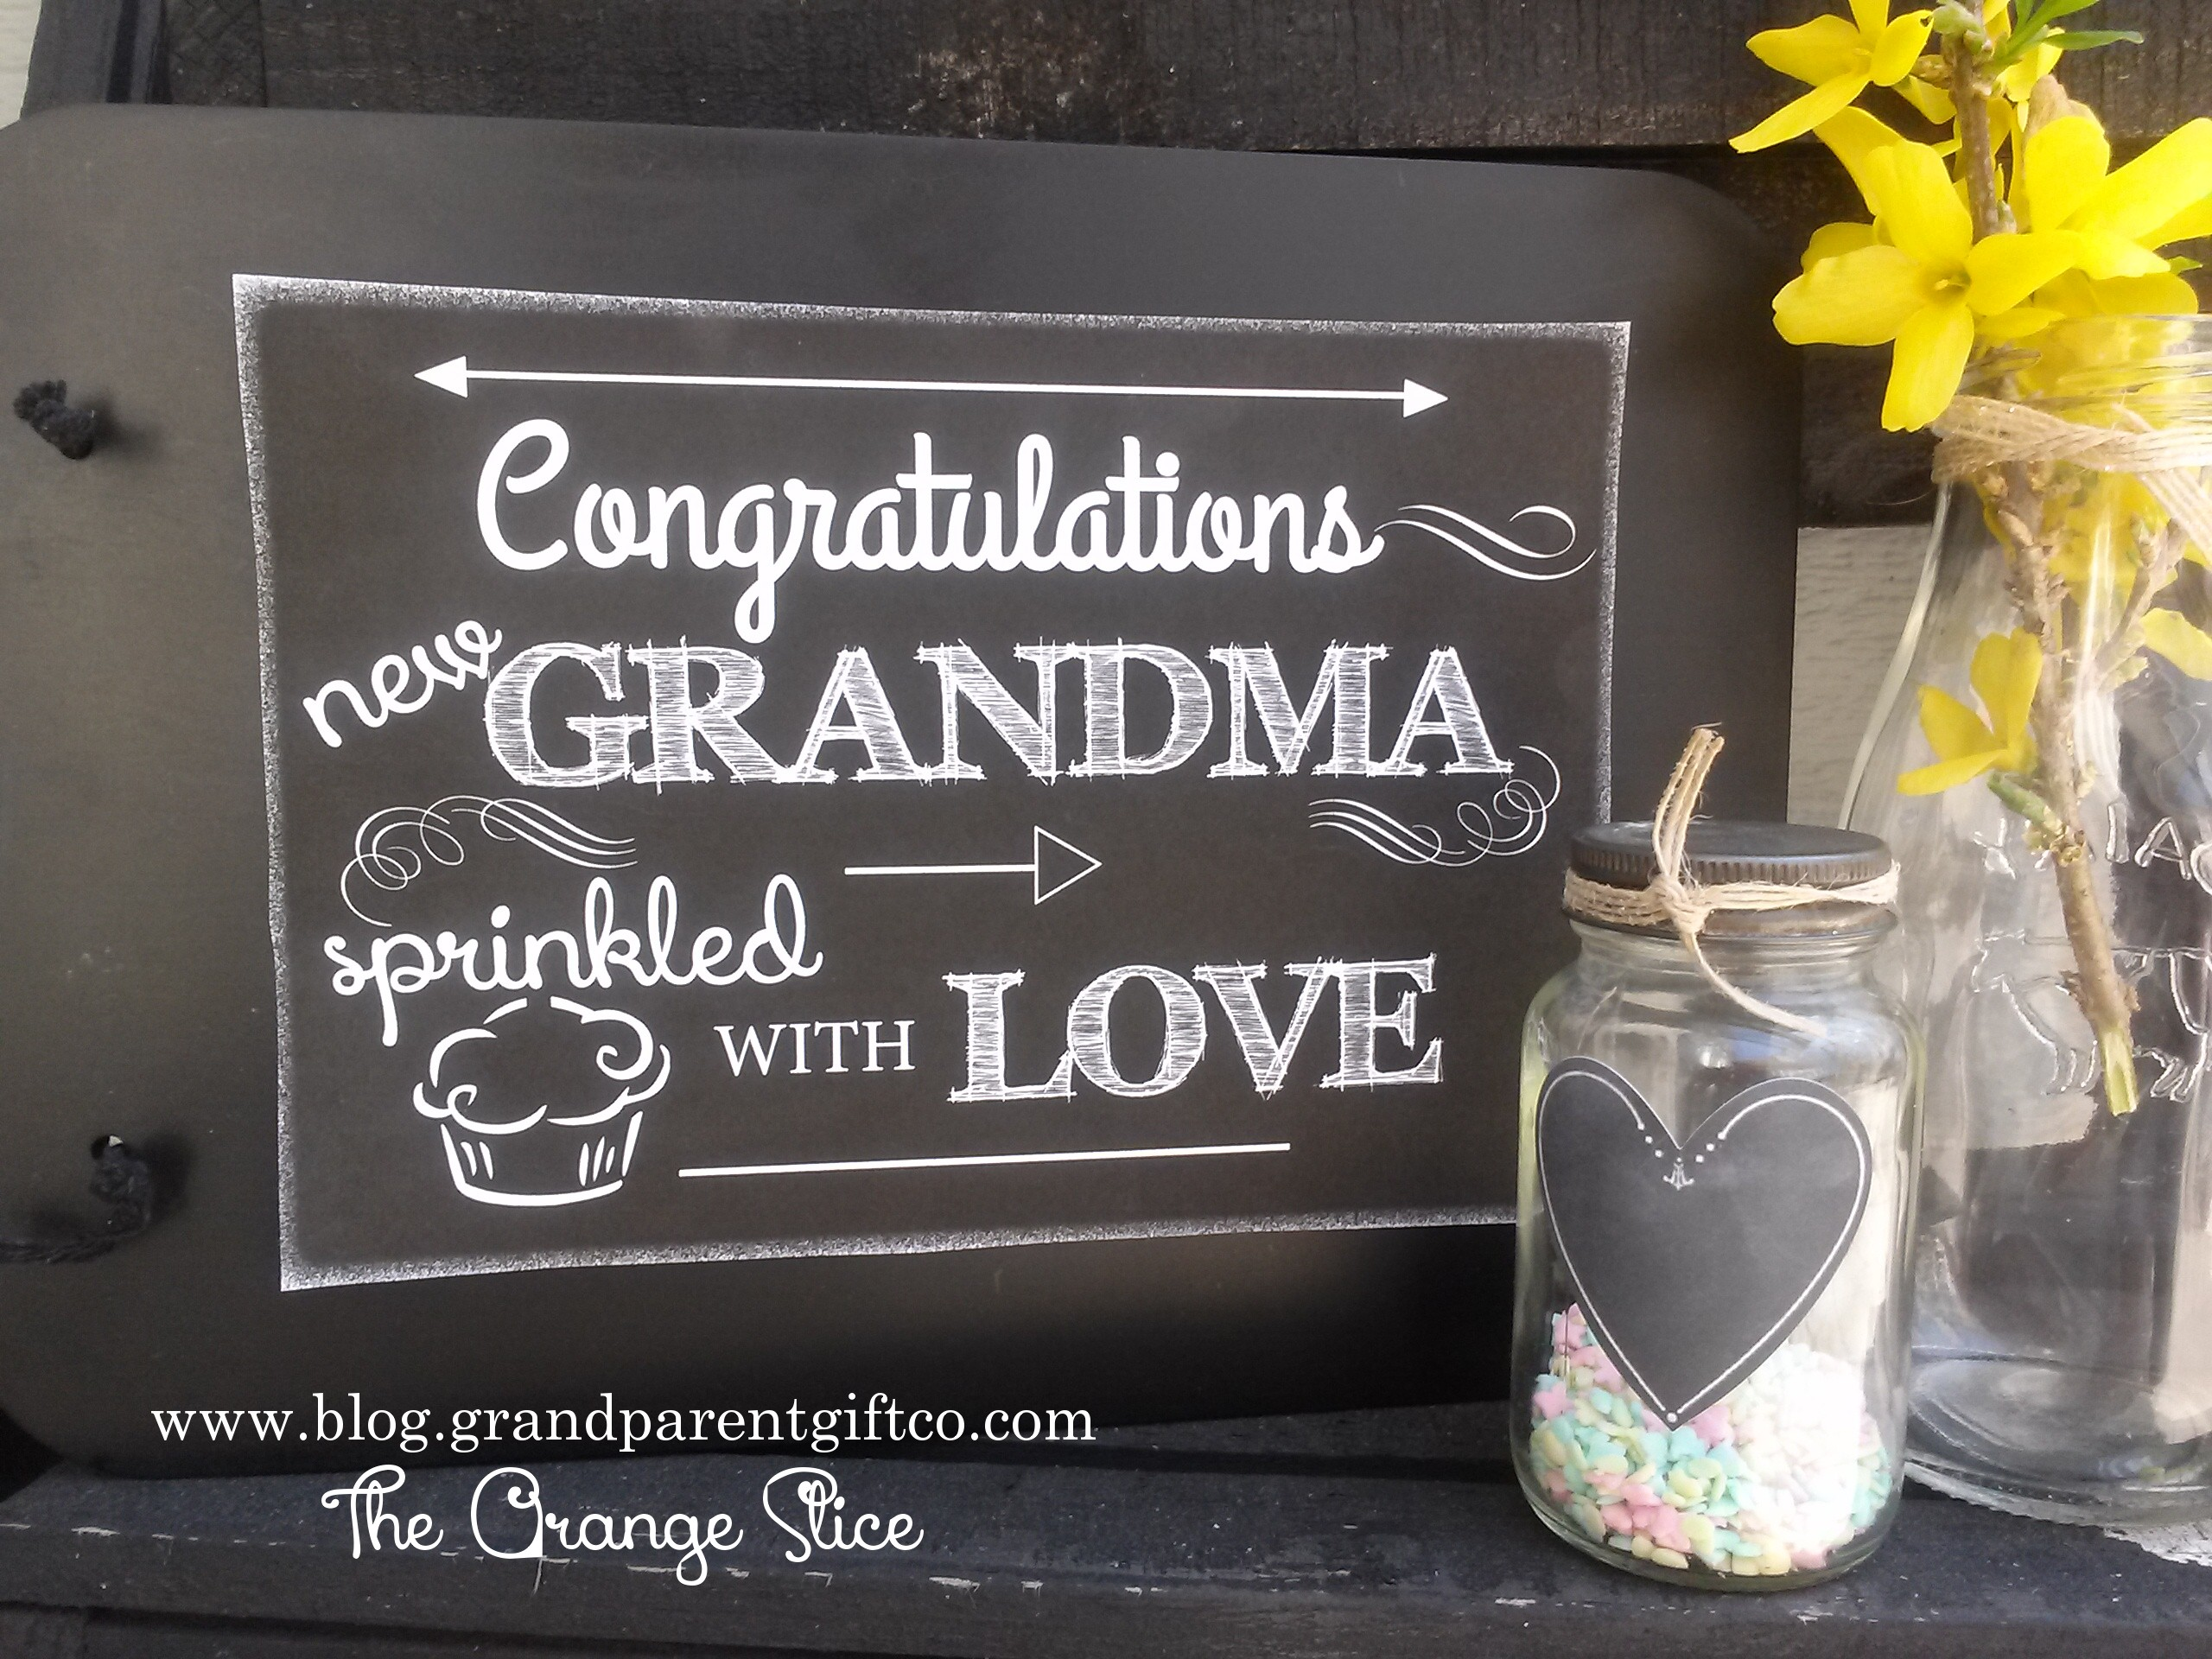 gift ideas for new grandma | The Orange SliceThe Orange Slice